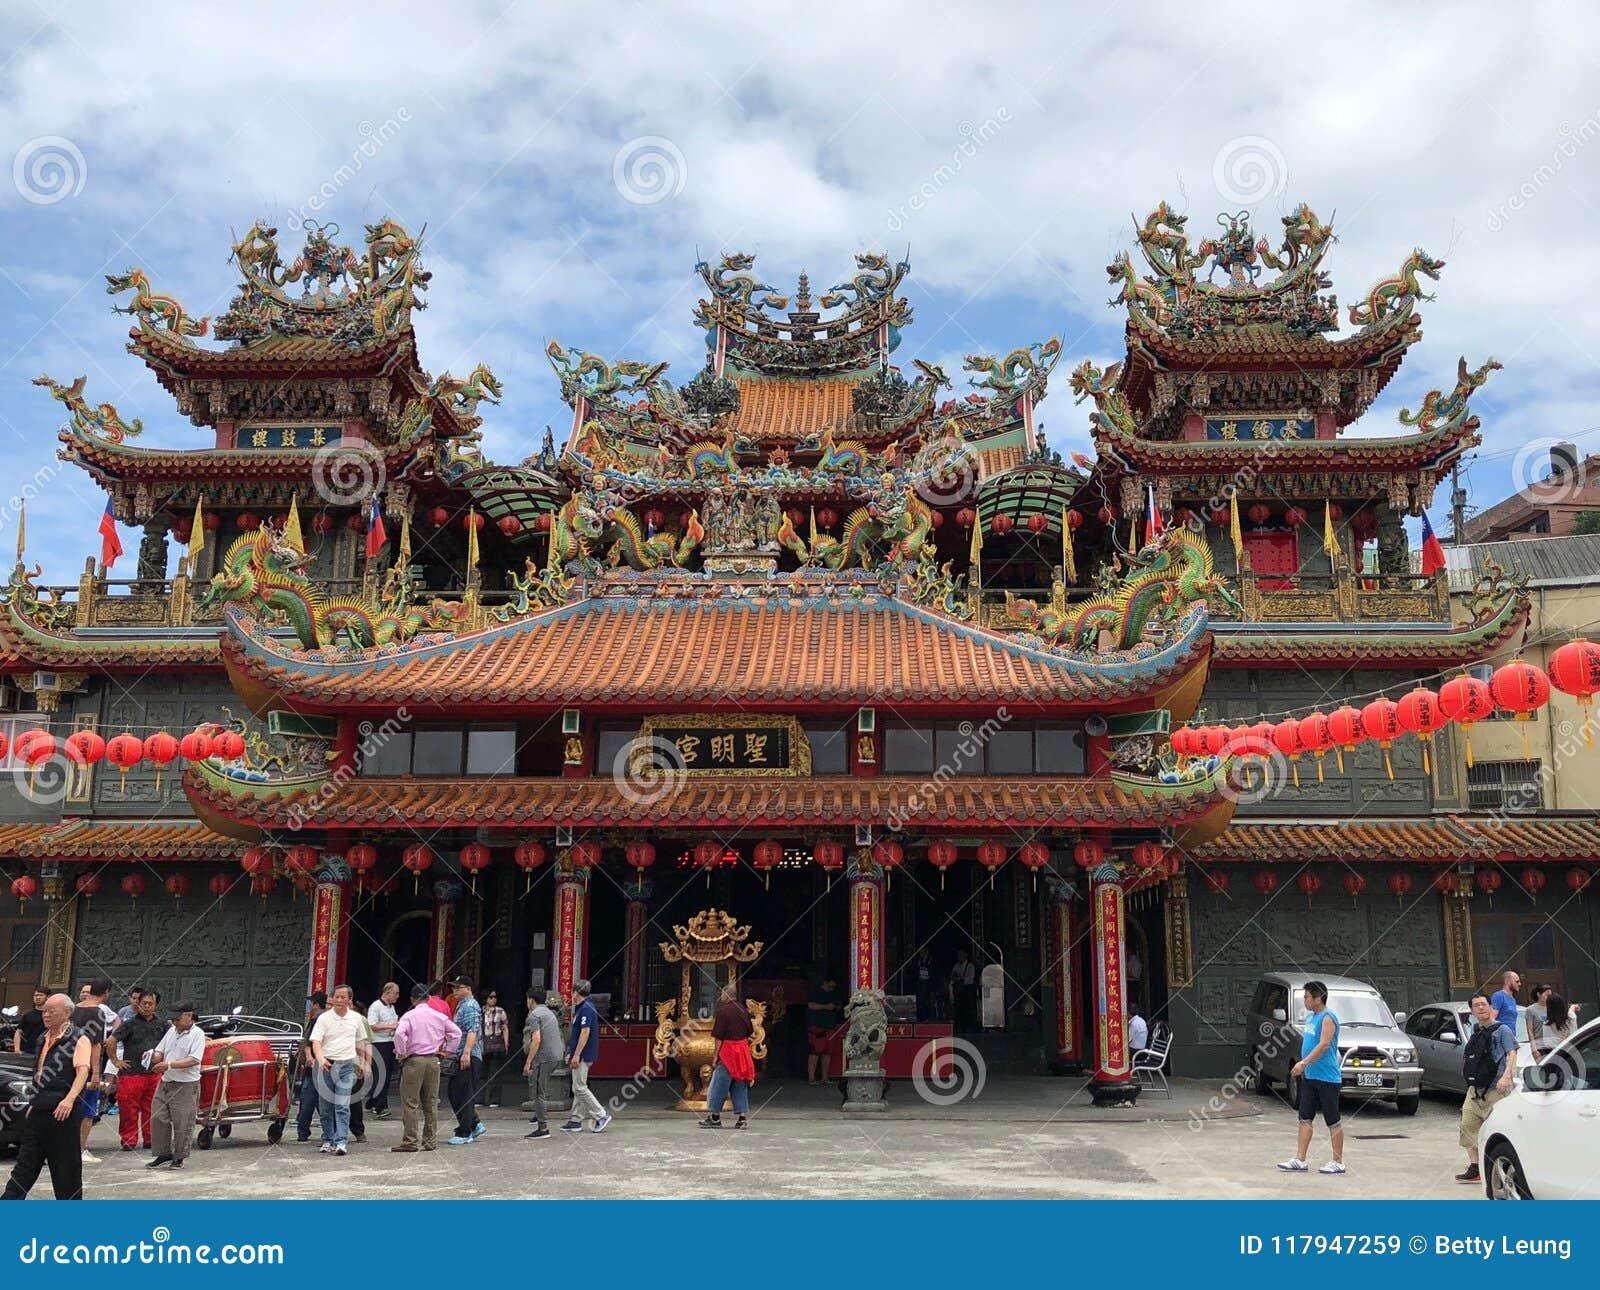 Jioufen, Taiwan - Mai 2018: Leute, die Buddha-` s Geburtstag am buddhistischen Tempel in Jioufen, Taiwan feiern